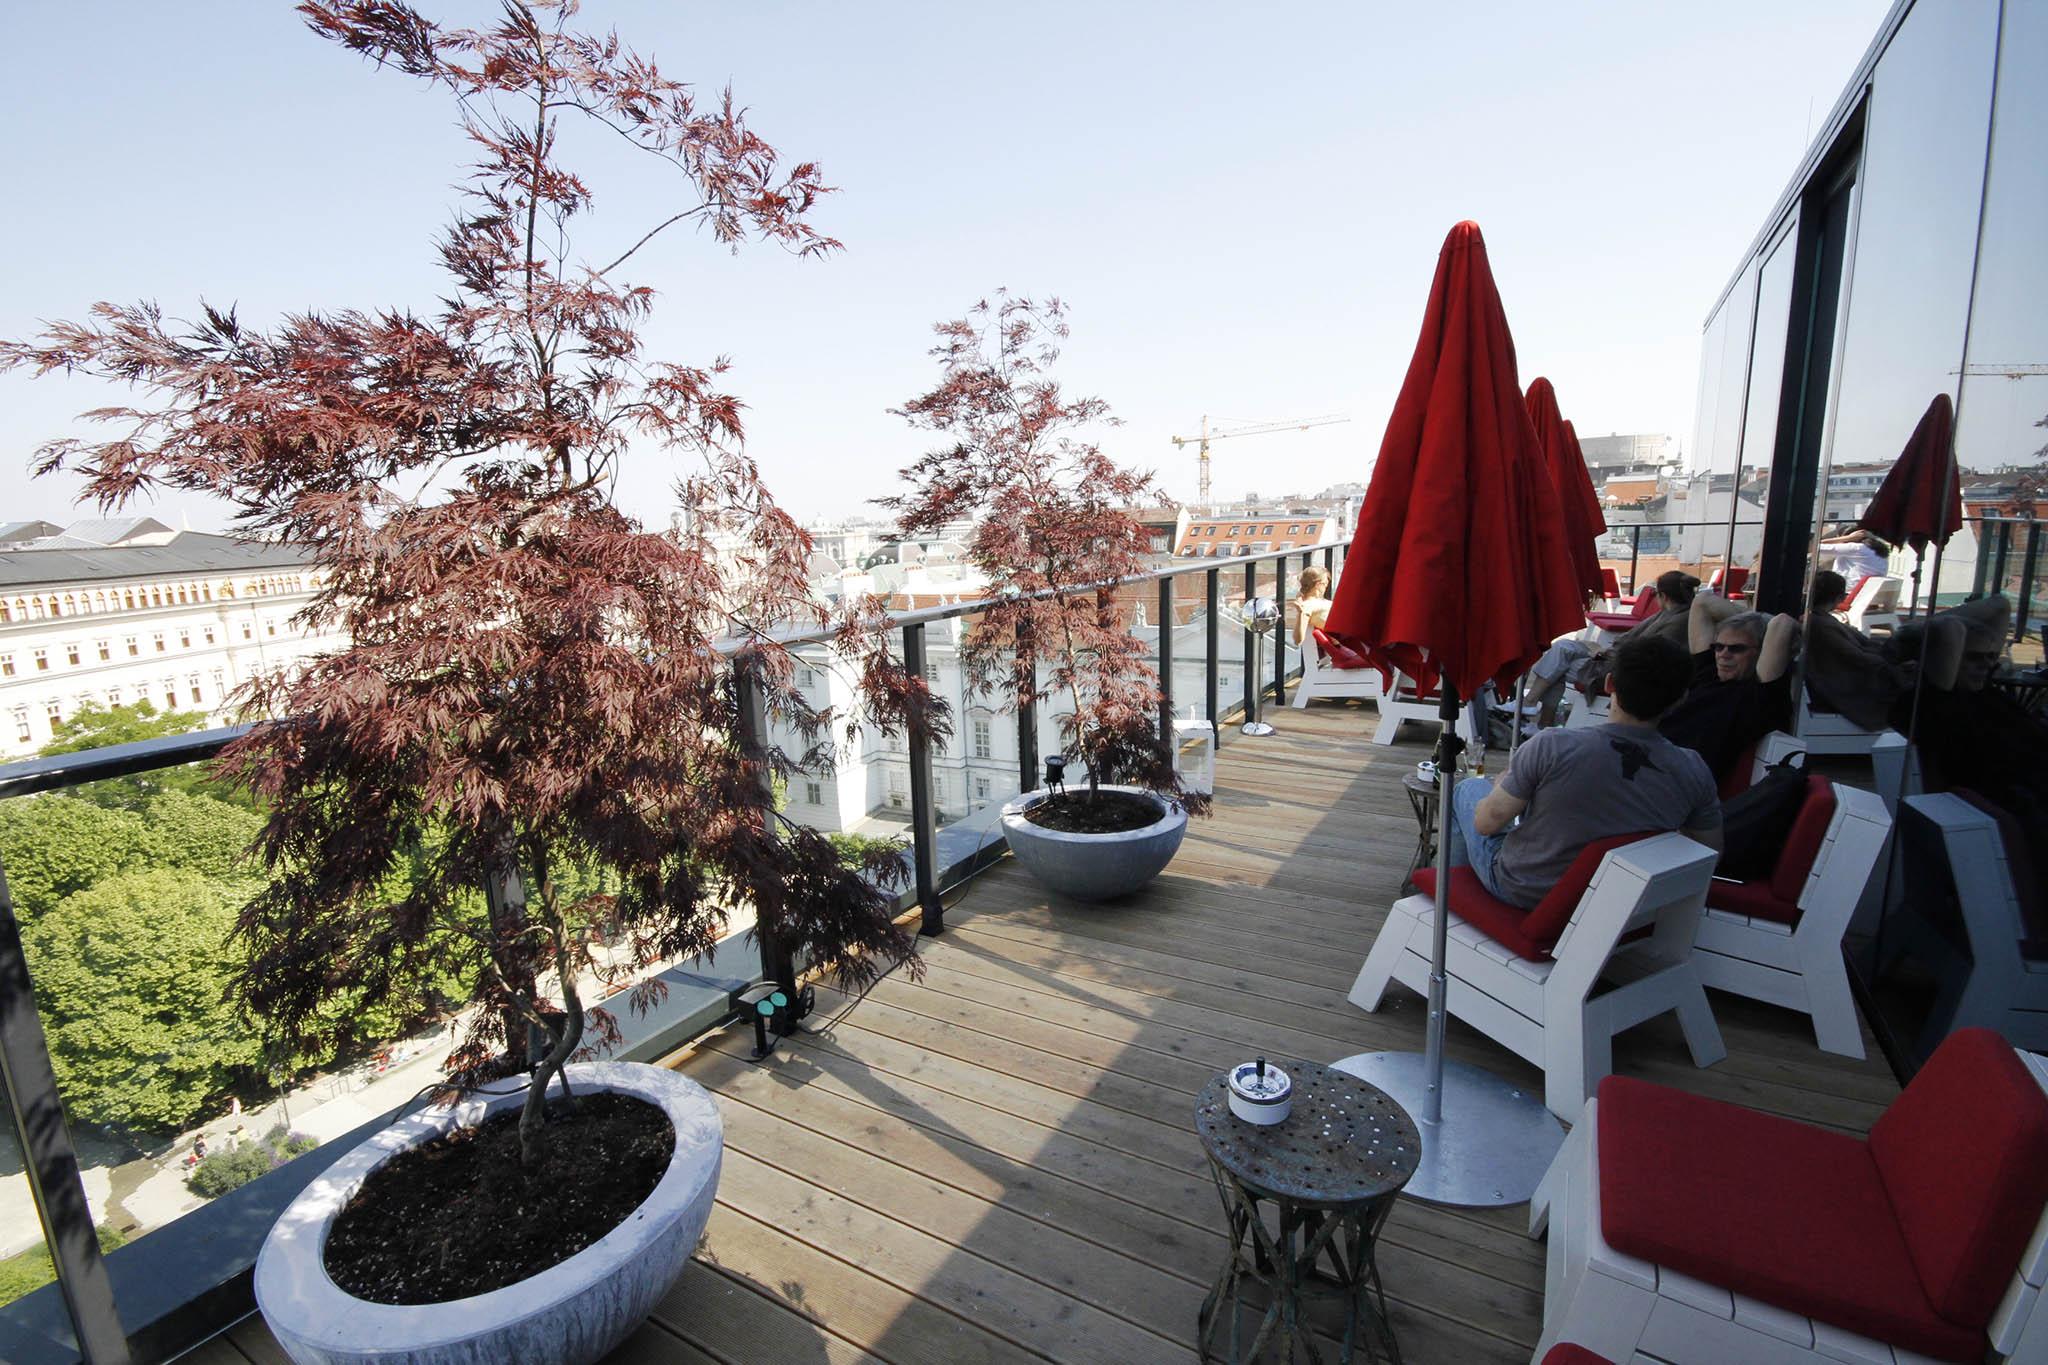 2017-04-25hrs-Hotel-Wien - 25-hours-hotel-vienna-nectarandpulse-rooftop-28.jpg